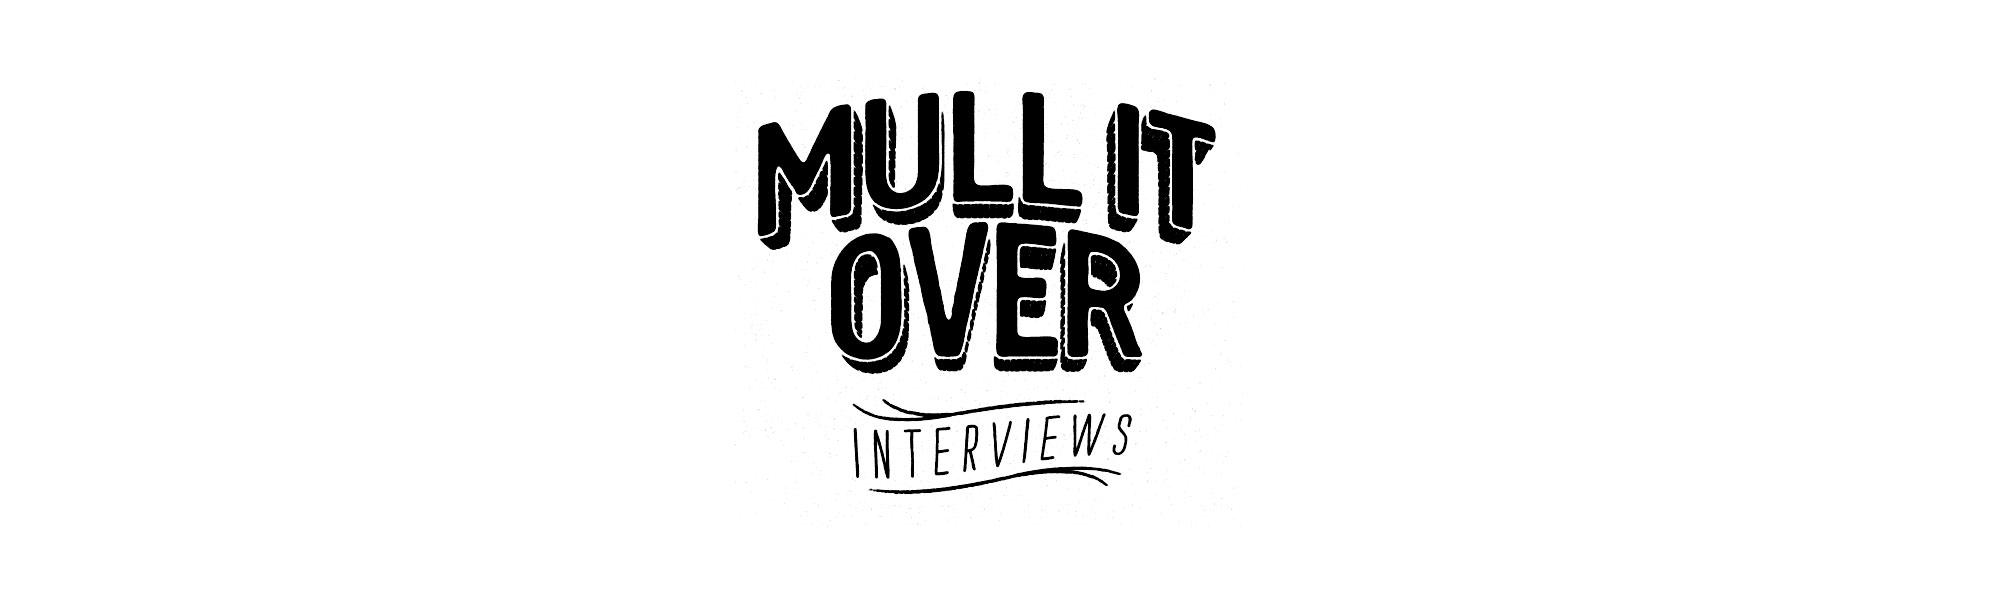 mullitover.cc: Karsten Thormaehlen …more